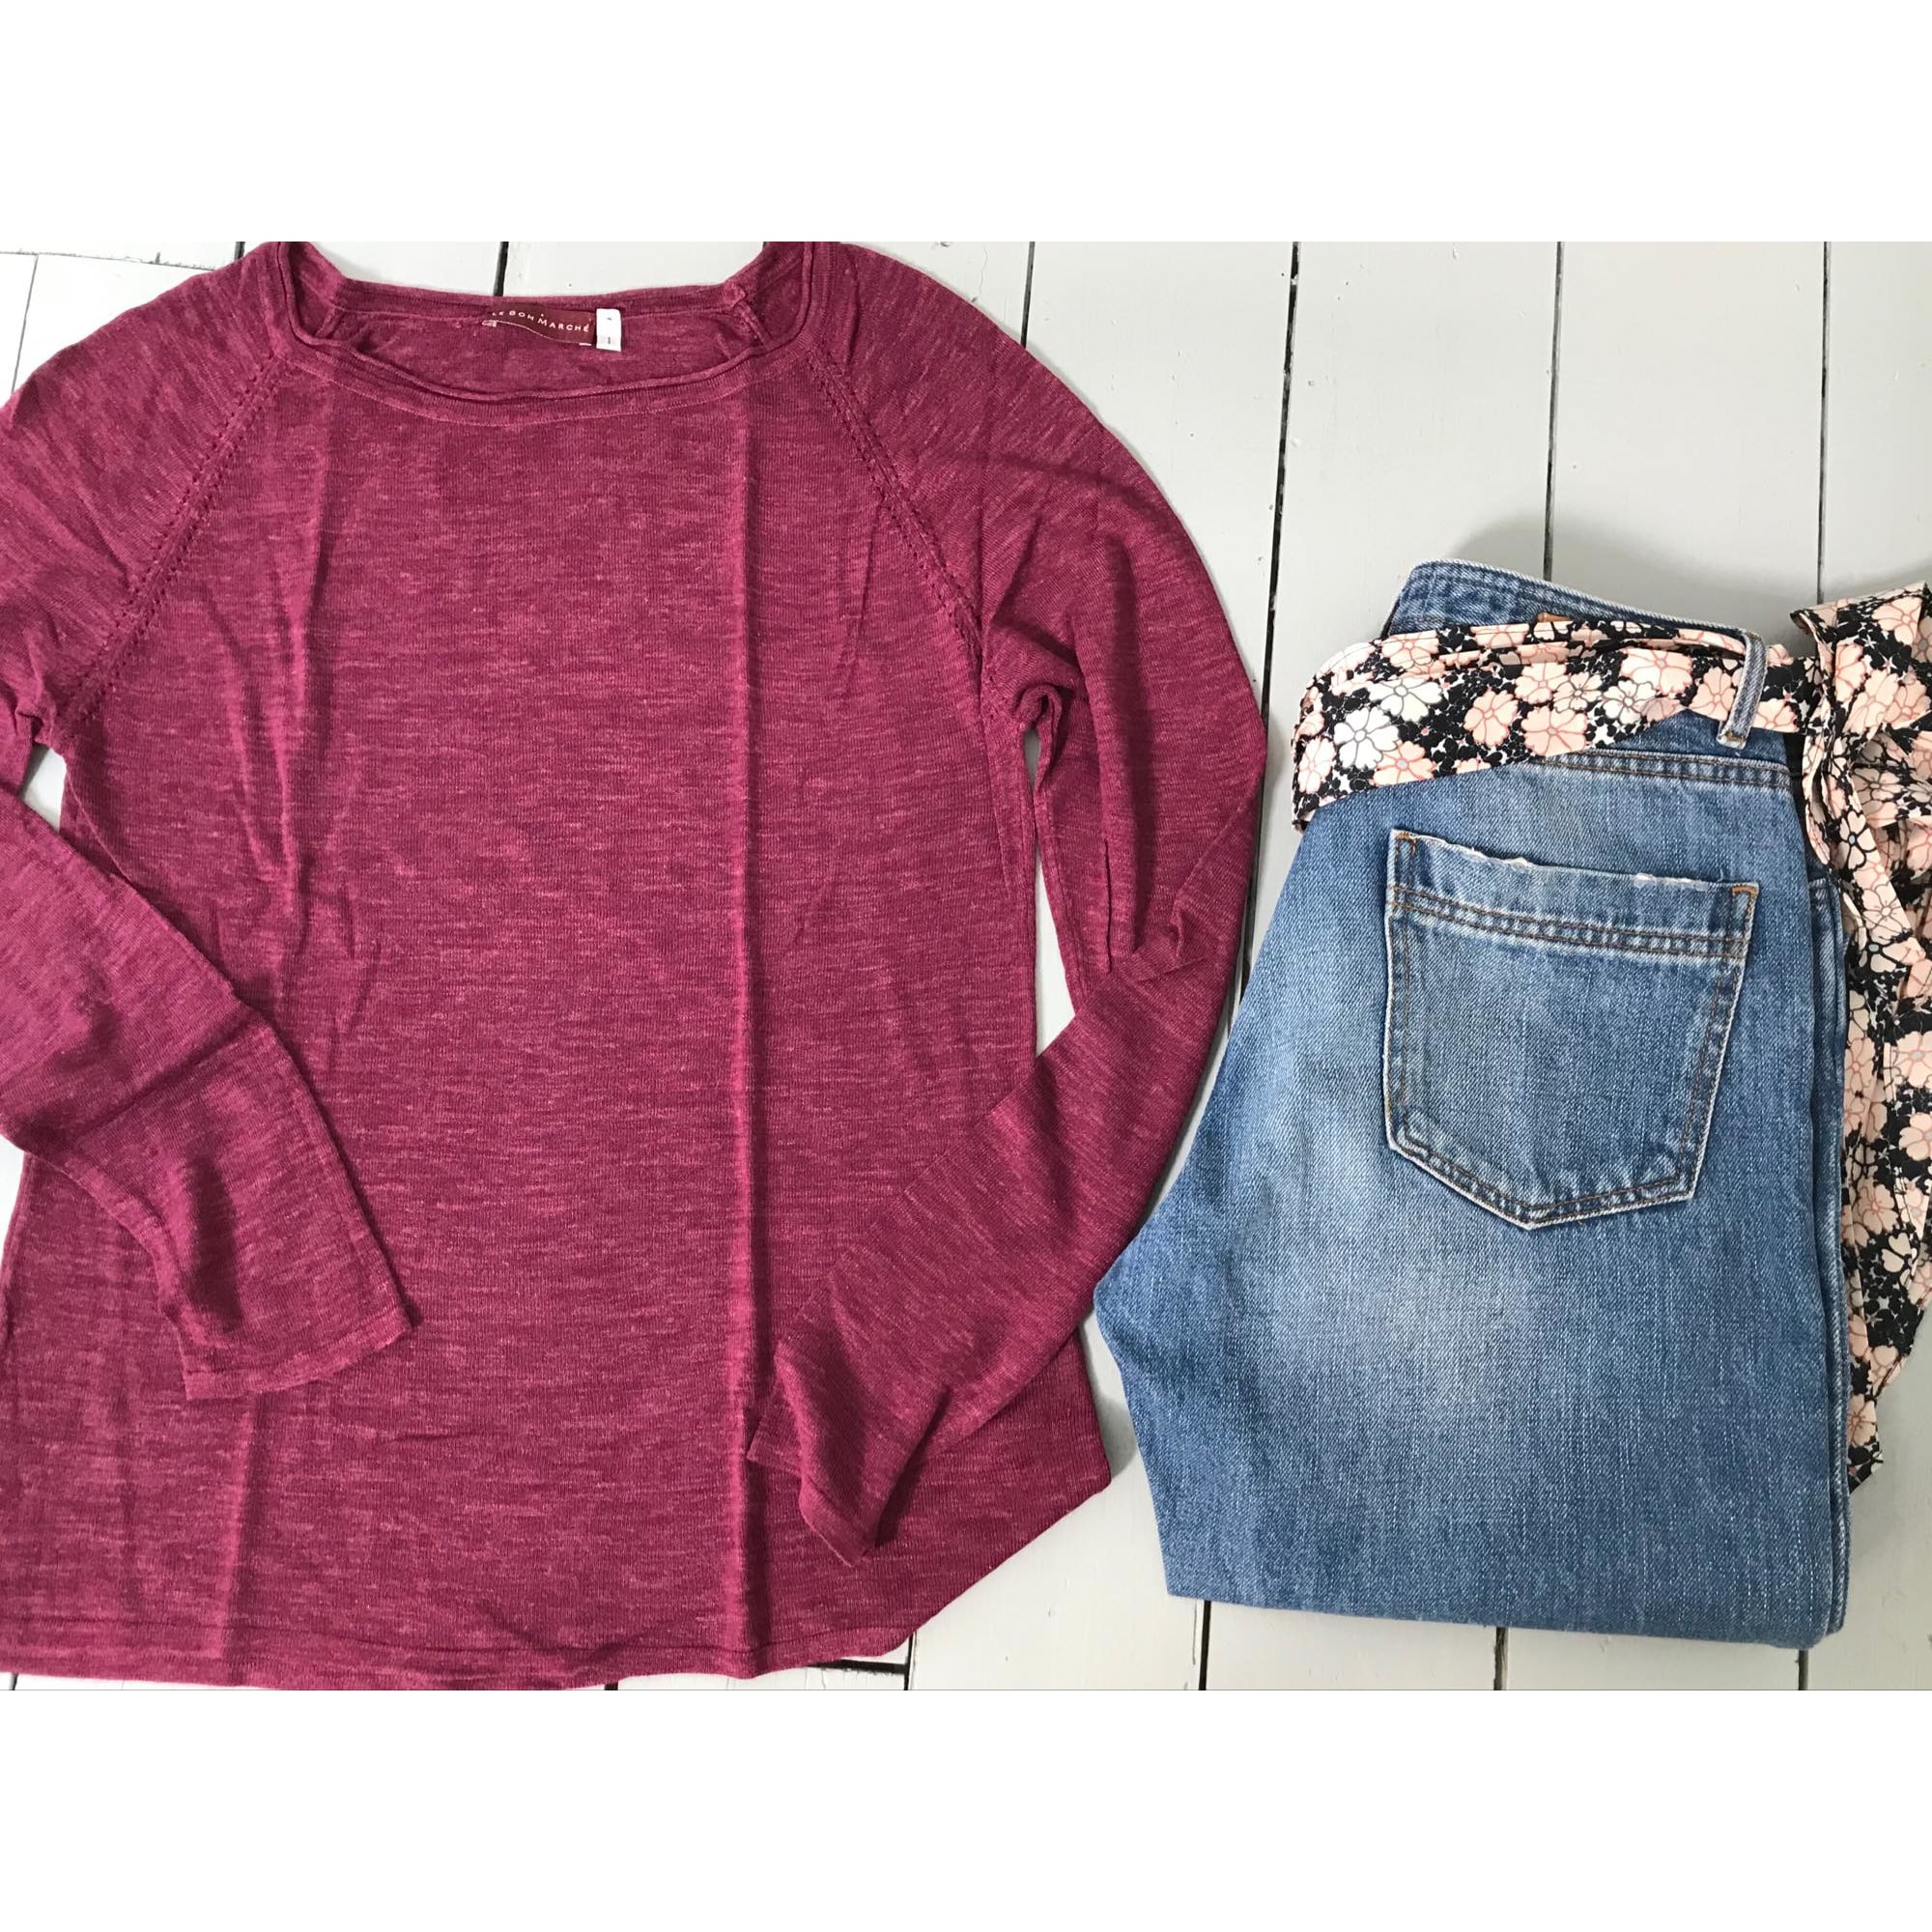 Top, tee-shirt LE BON MARCHÉ Rose, fuschia, vieux rose